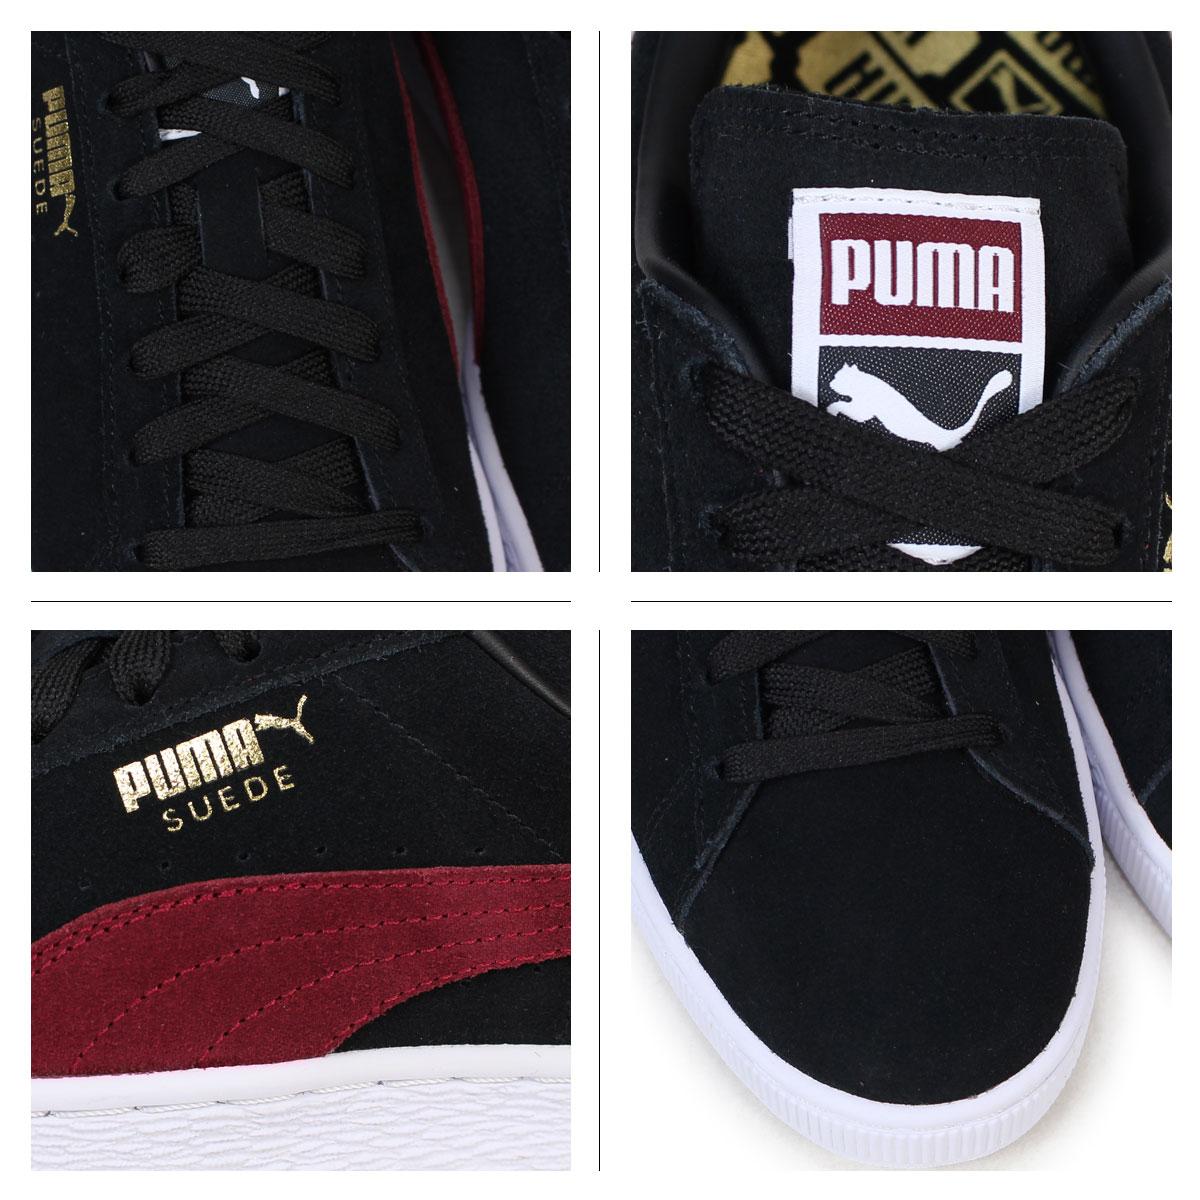 PUMA SUEDE CLASSIC + Puma suede classical music sneakers 363,242 31 men's lady's shoes black